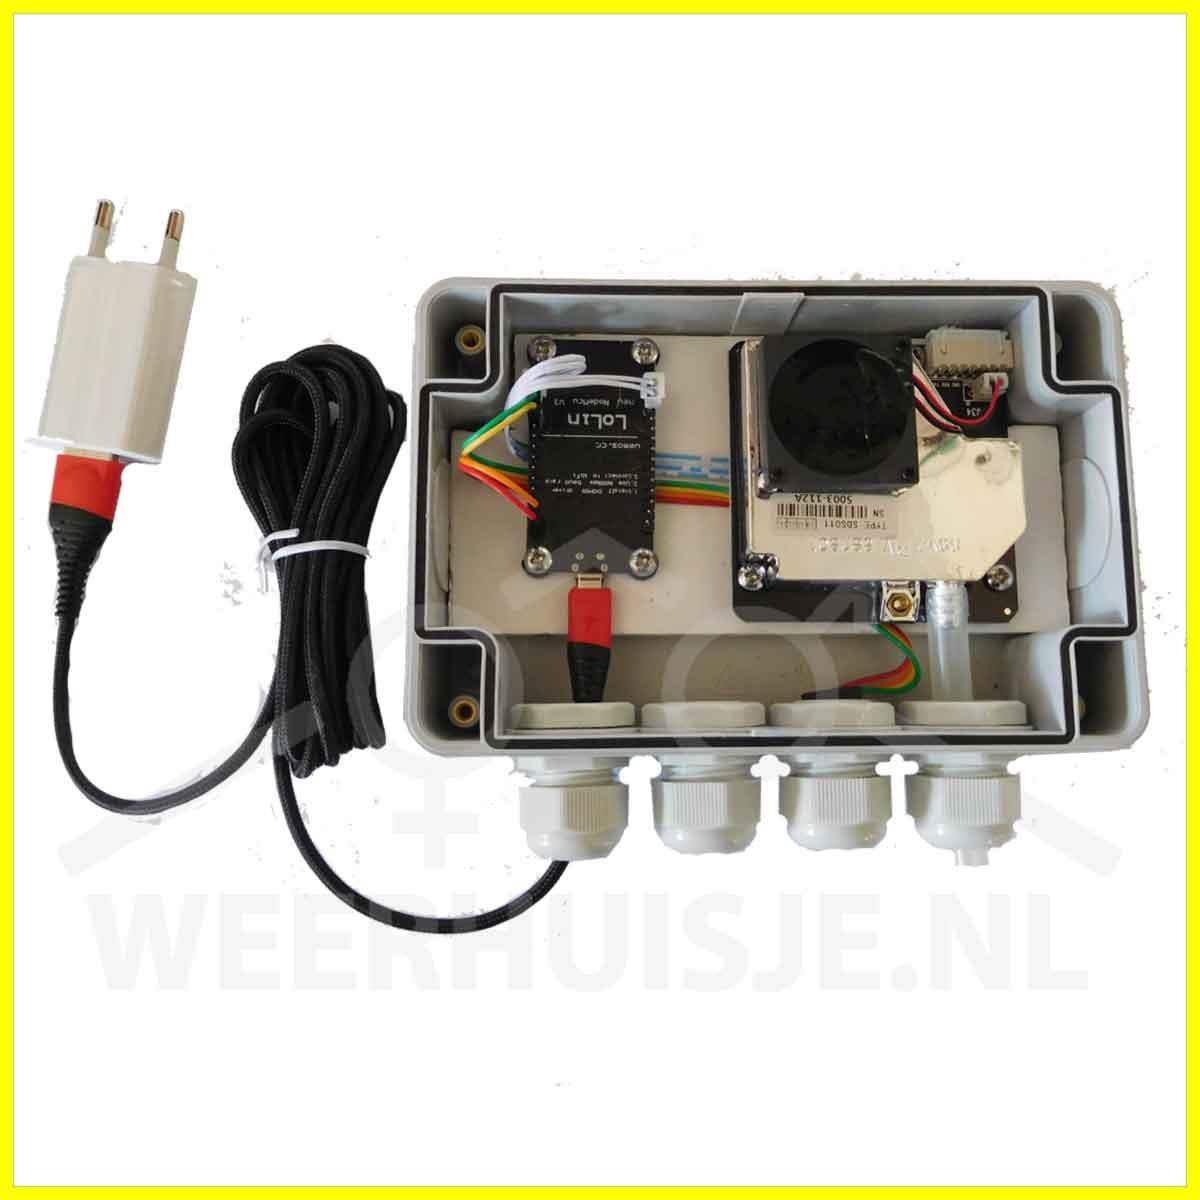 WH FS-01-Box Fijnstof meetstation luchtkwaliteit Type Box